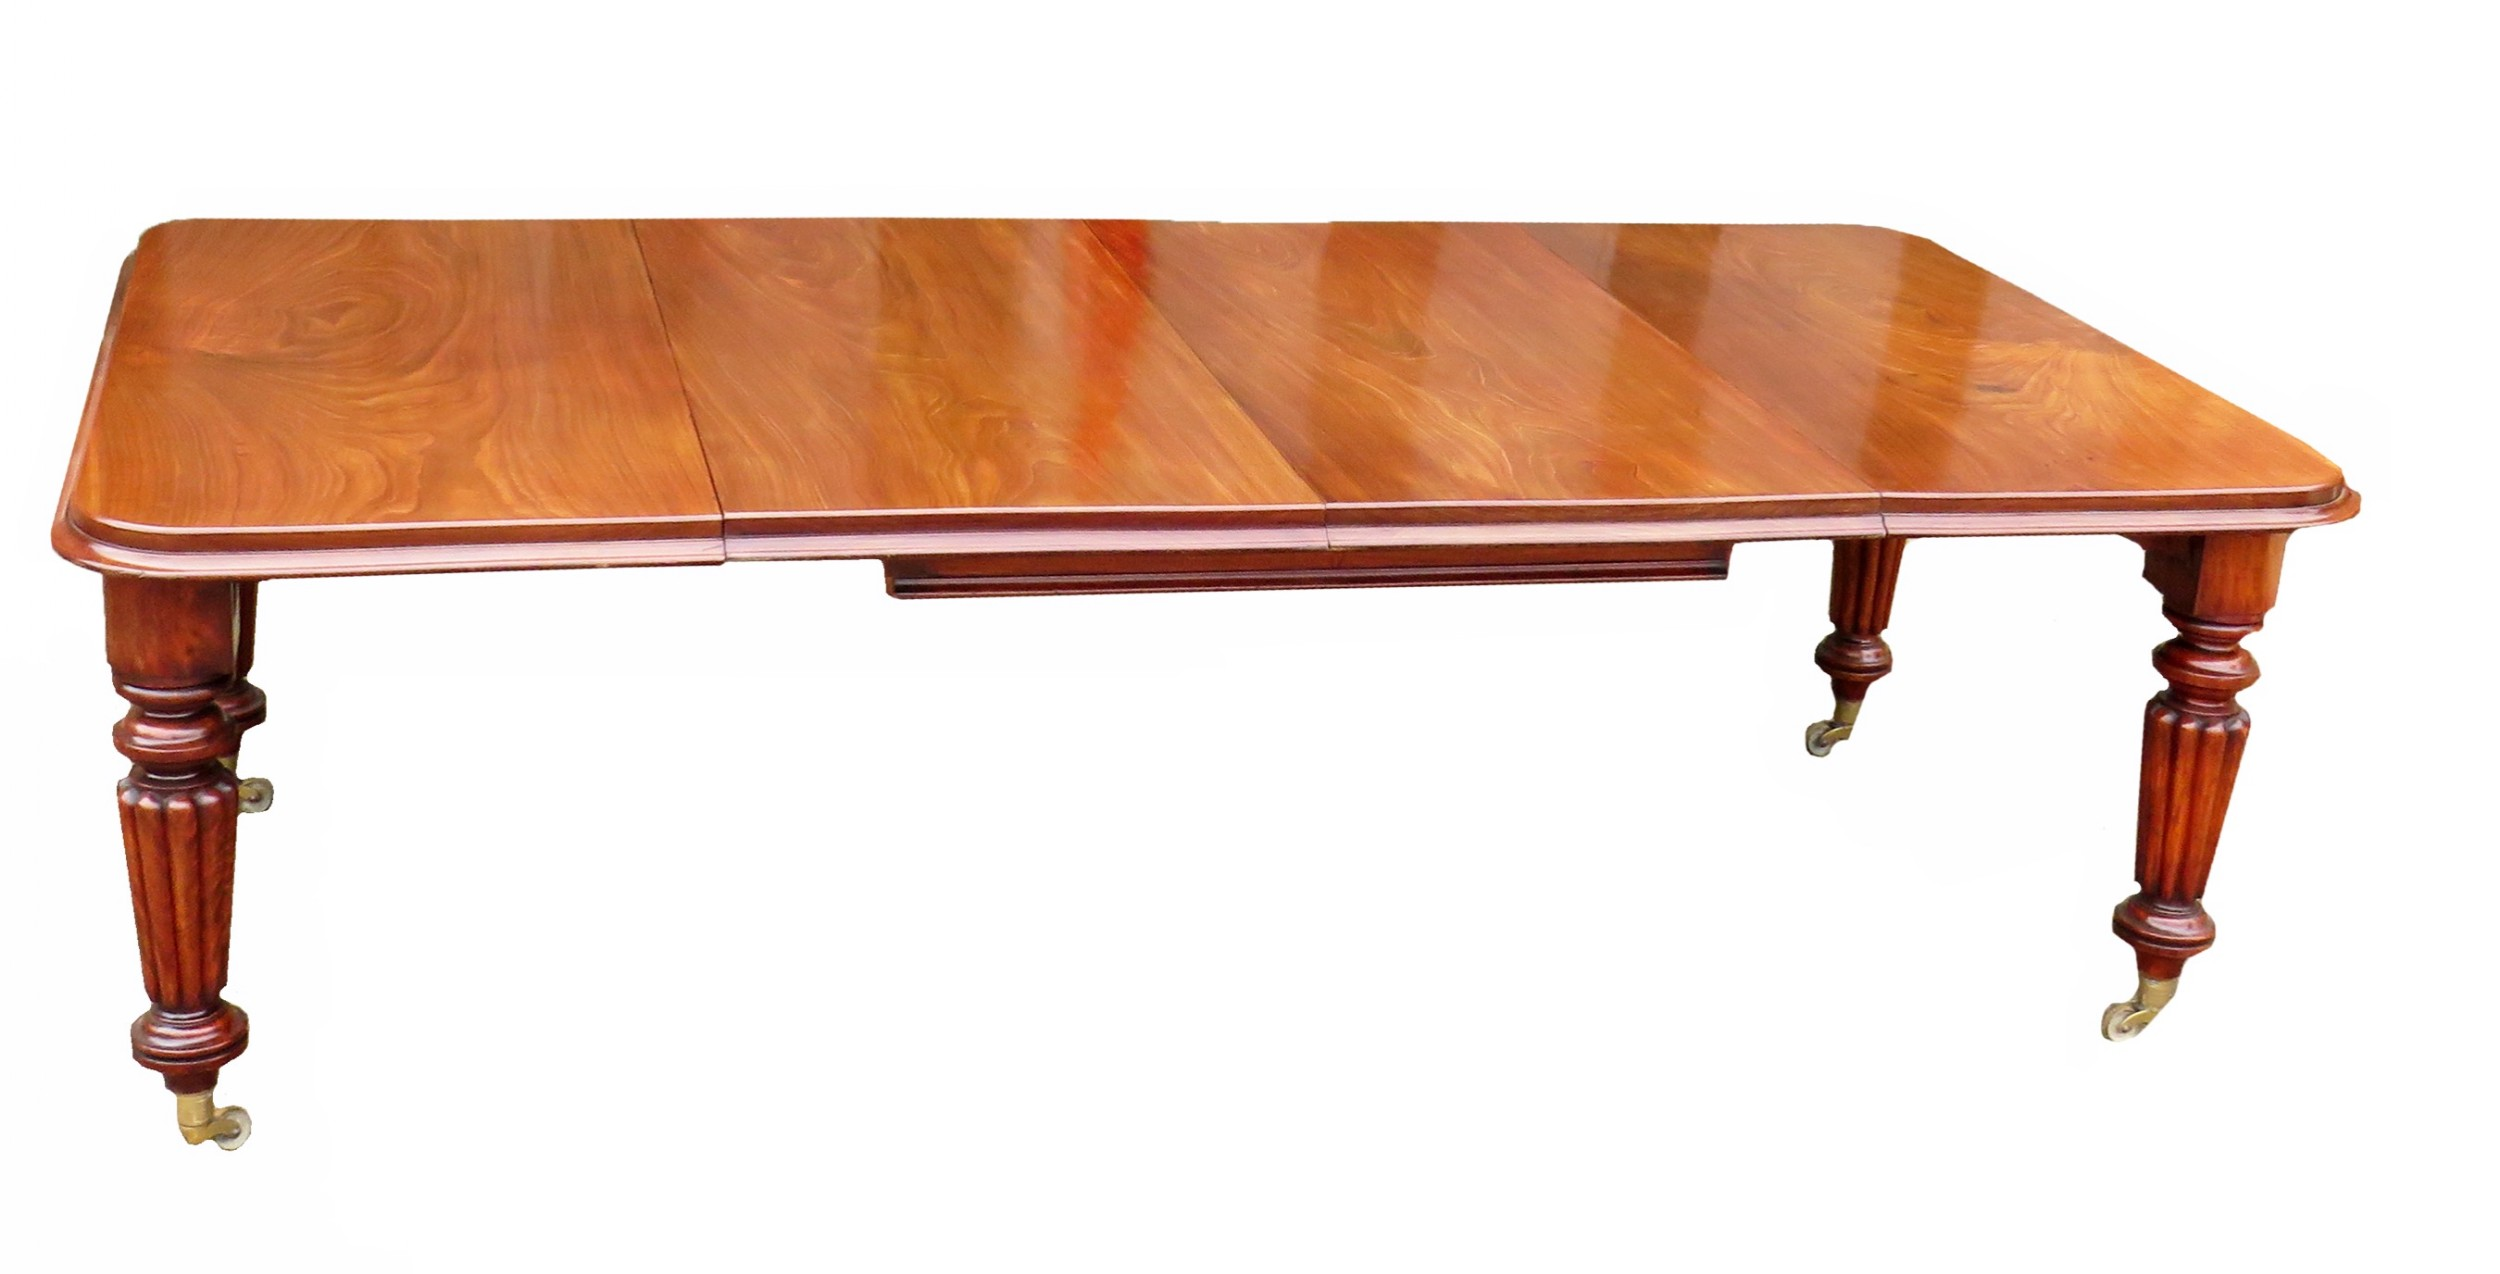 19th century victorian mahogany extending dining table